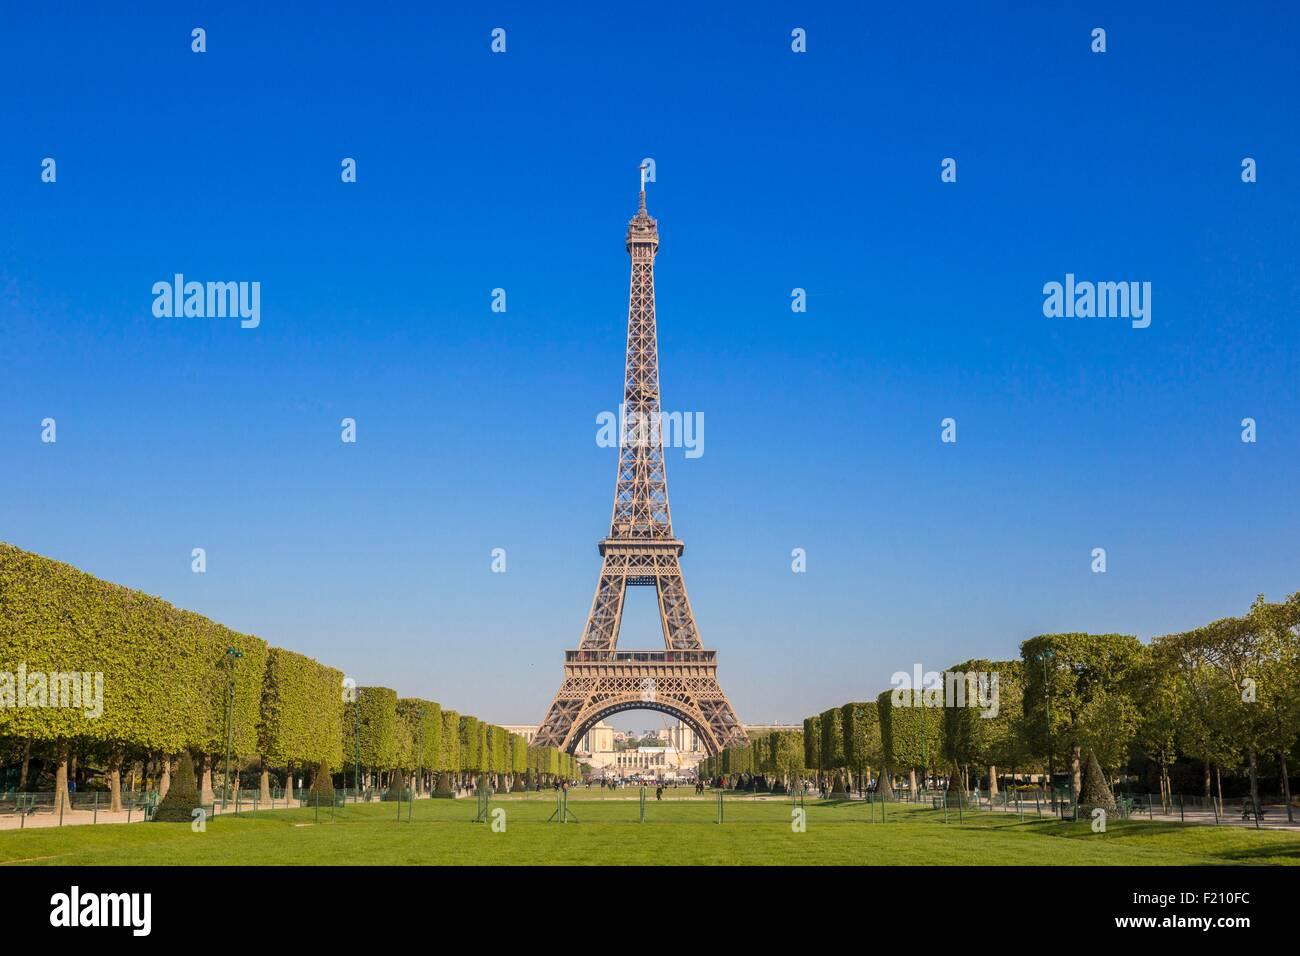 France, Paris, the Champ de Mars World Heritage of UNESCO, the Eiffel Tower - Stock Image